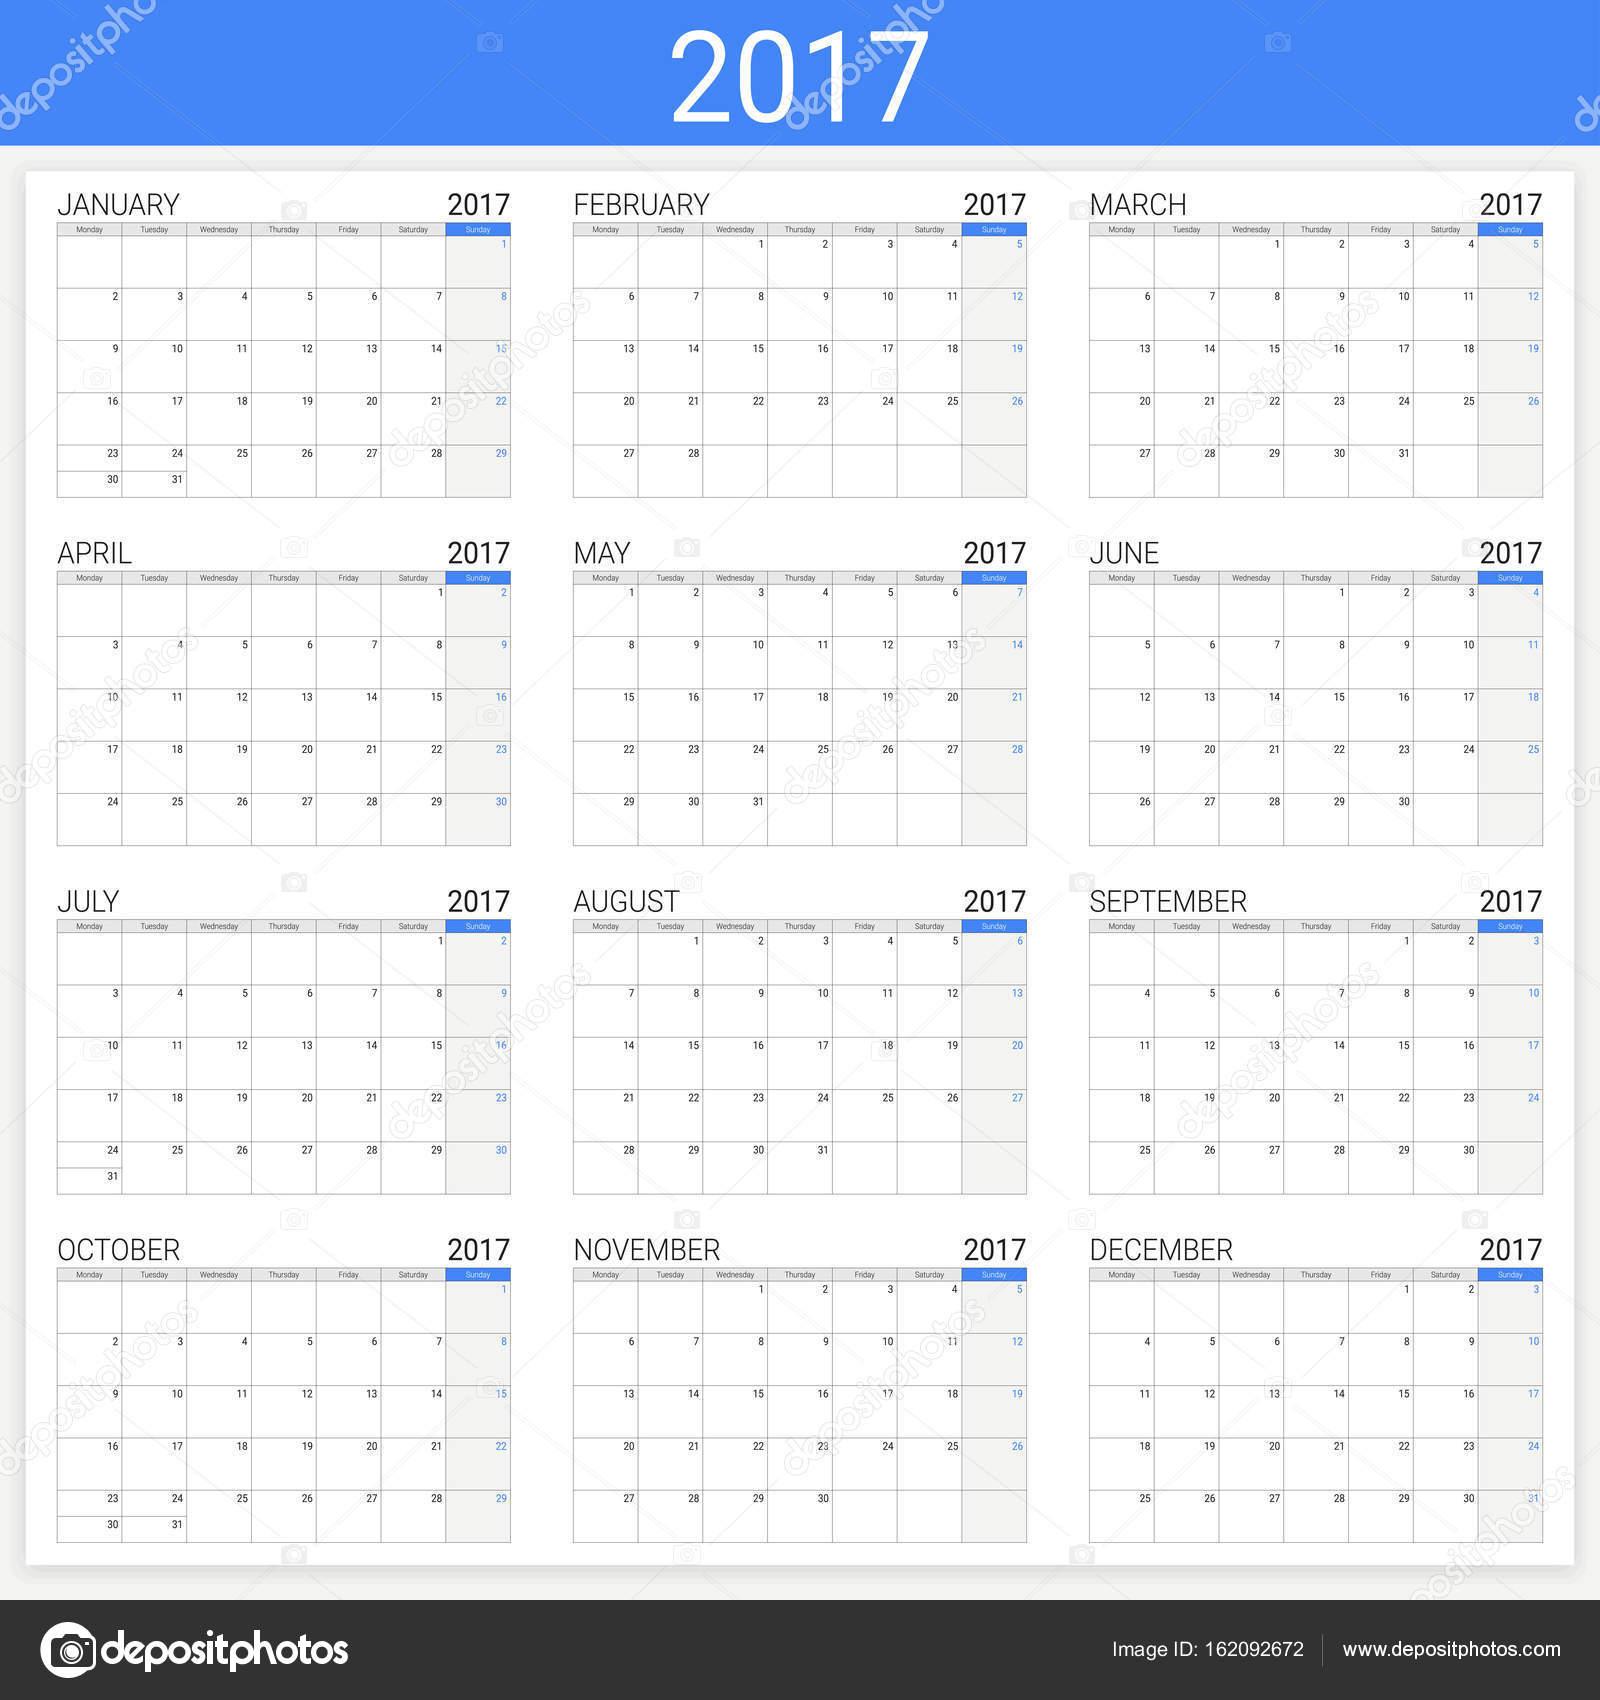 2017 Calendar Or Desk Planner 12 Month Set Stock Vector